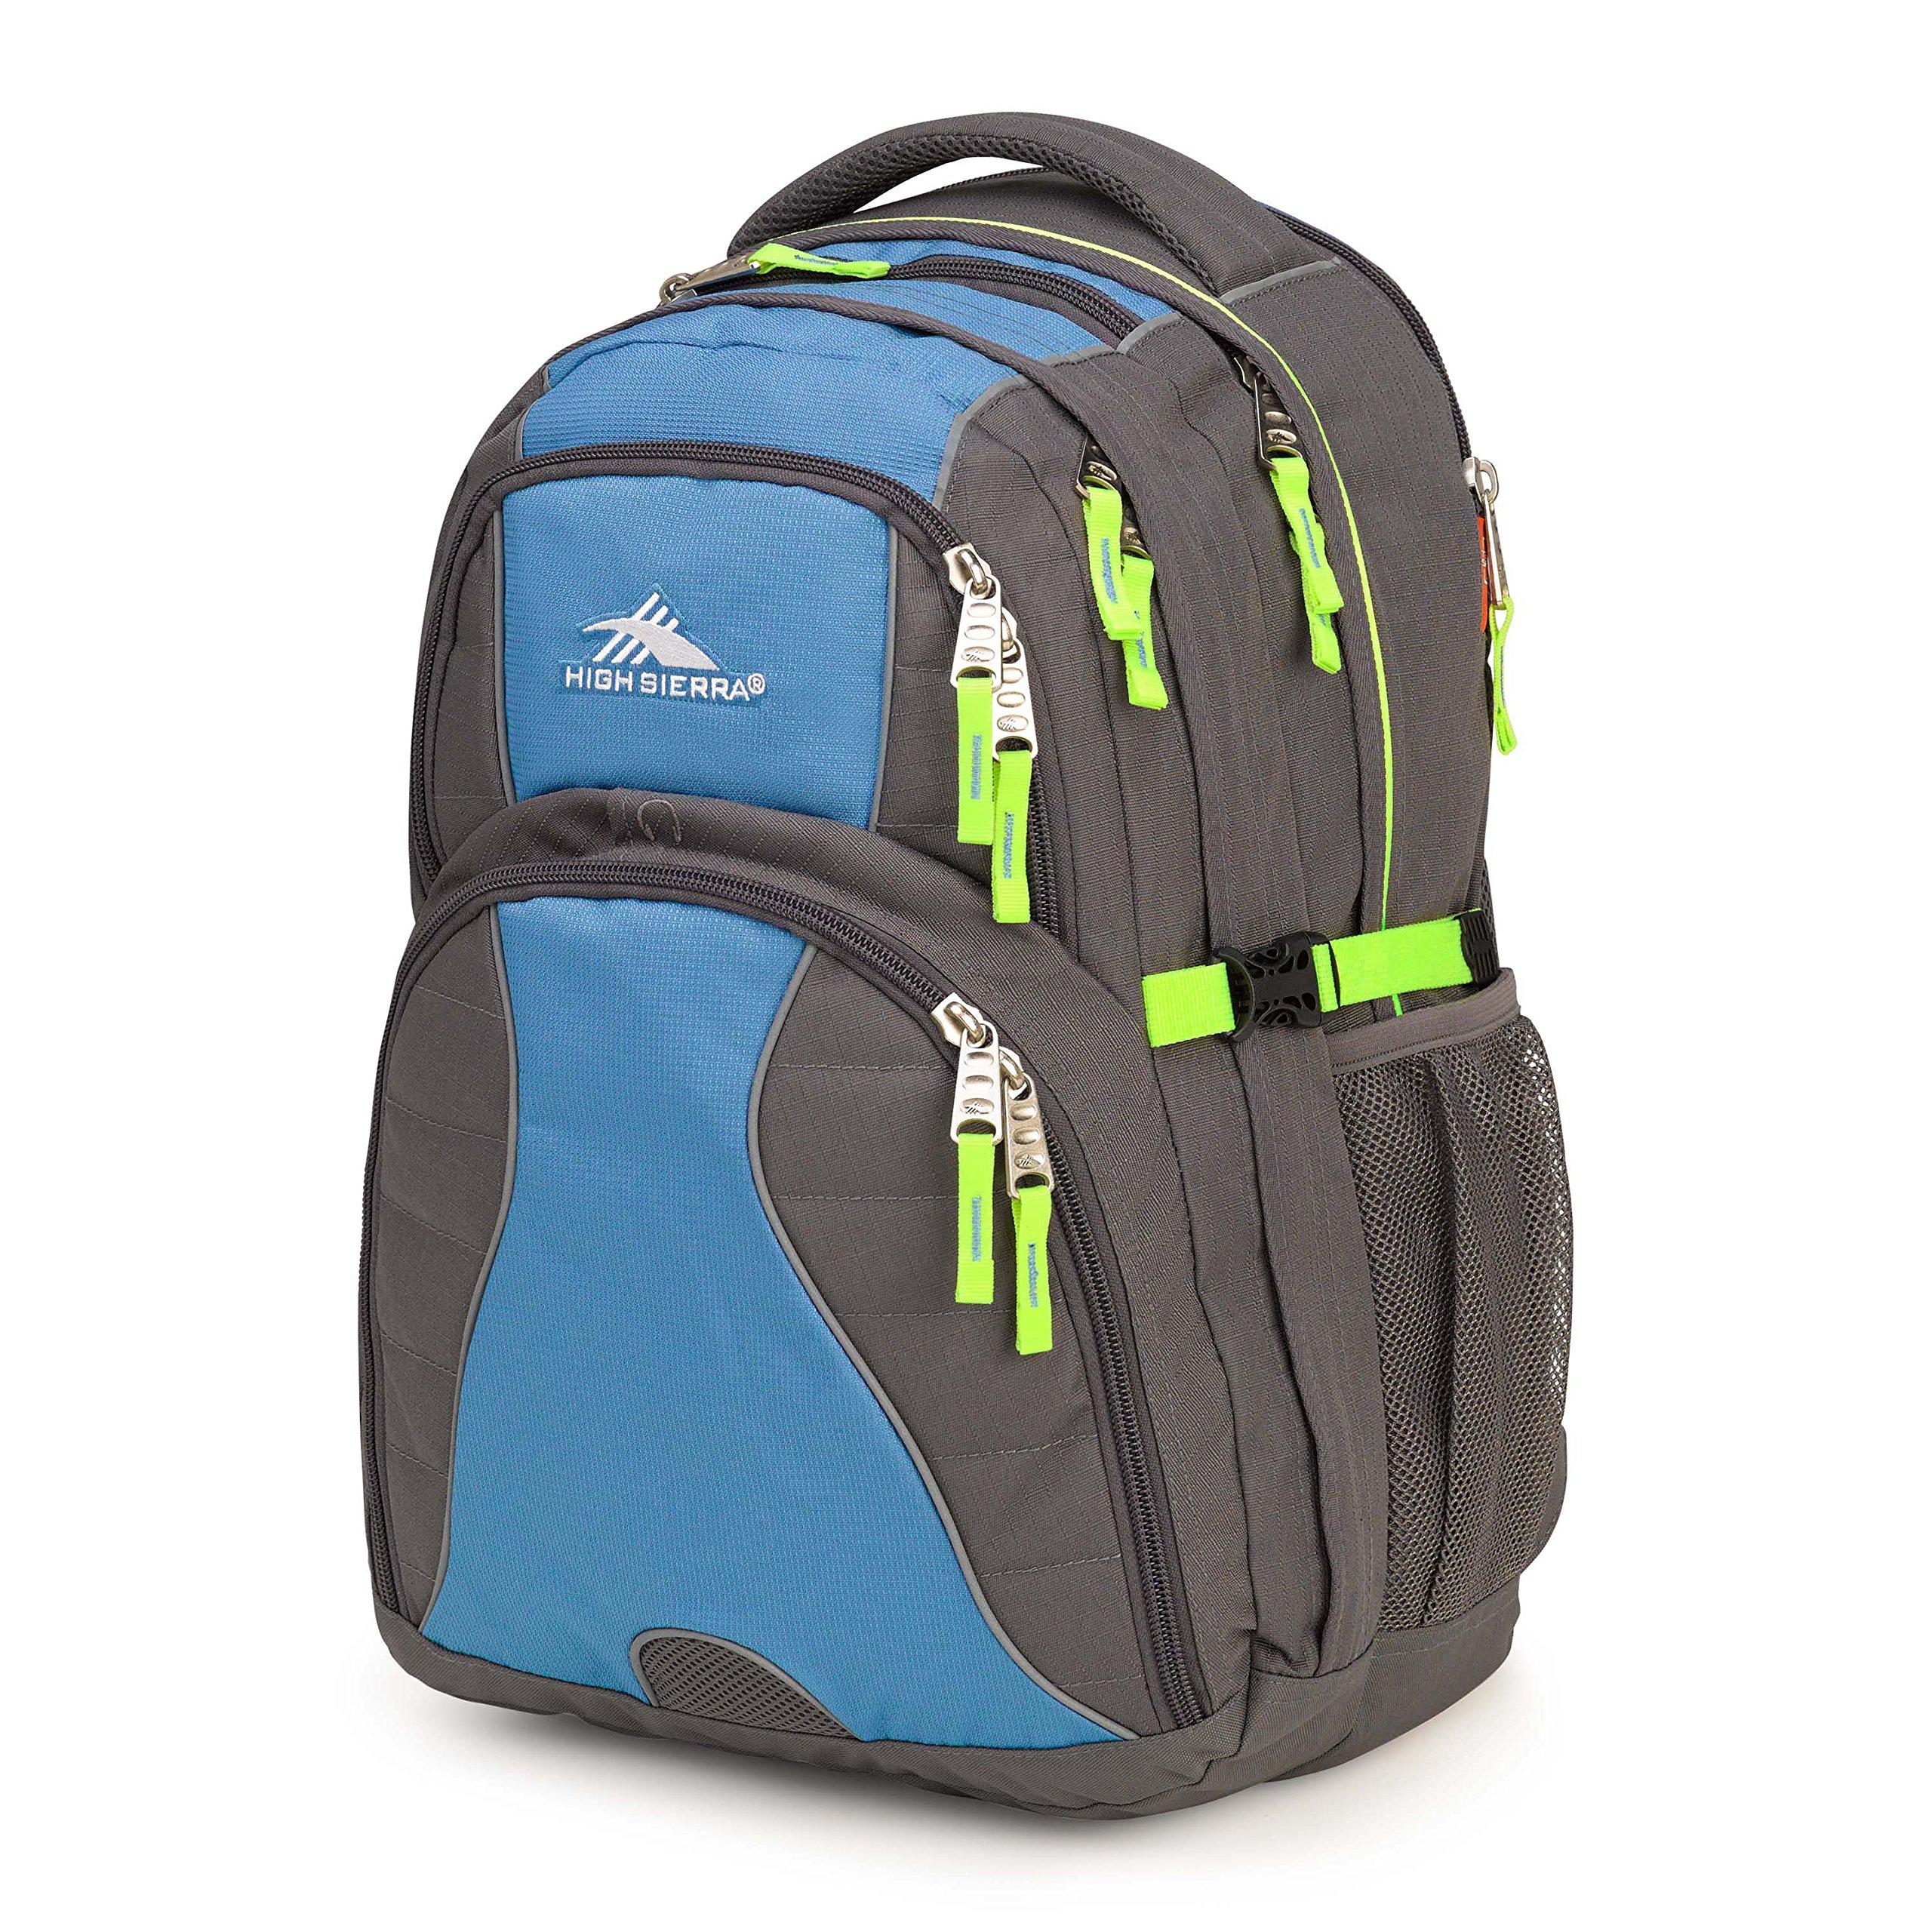 High Sierra Swerve Backpack Slate/Mineral/Zest